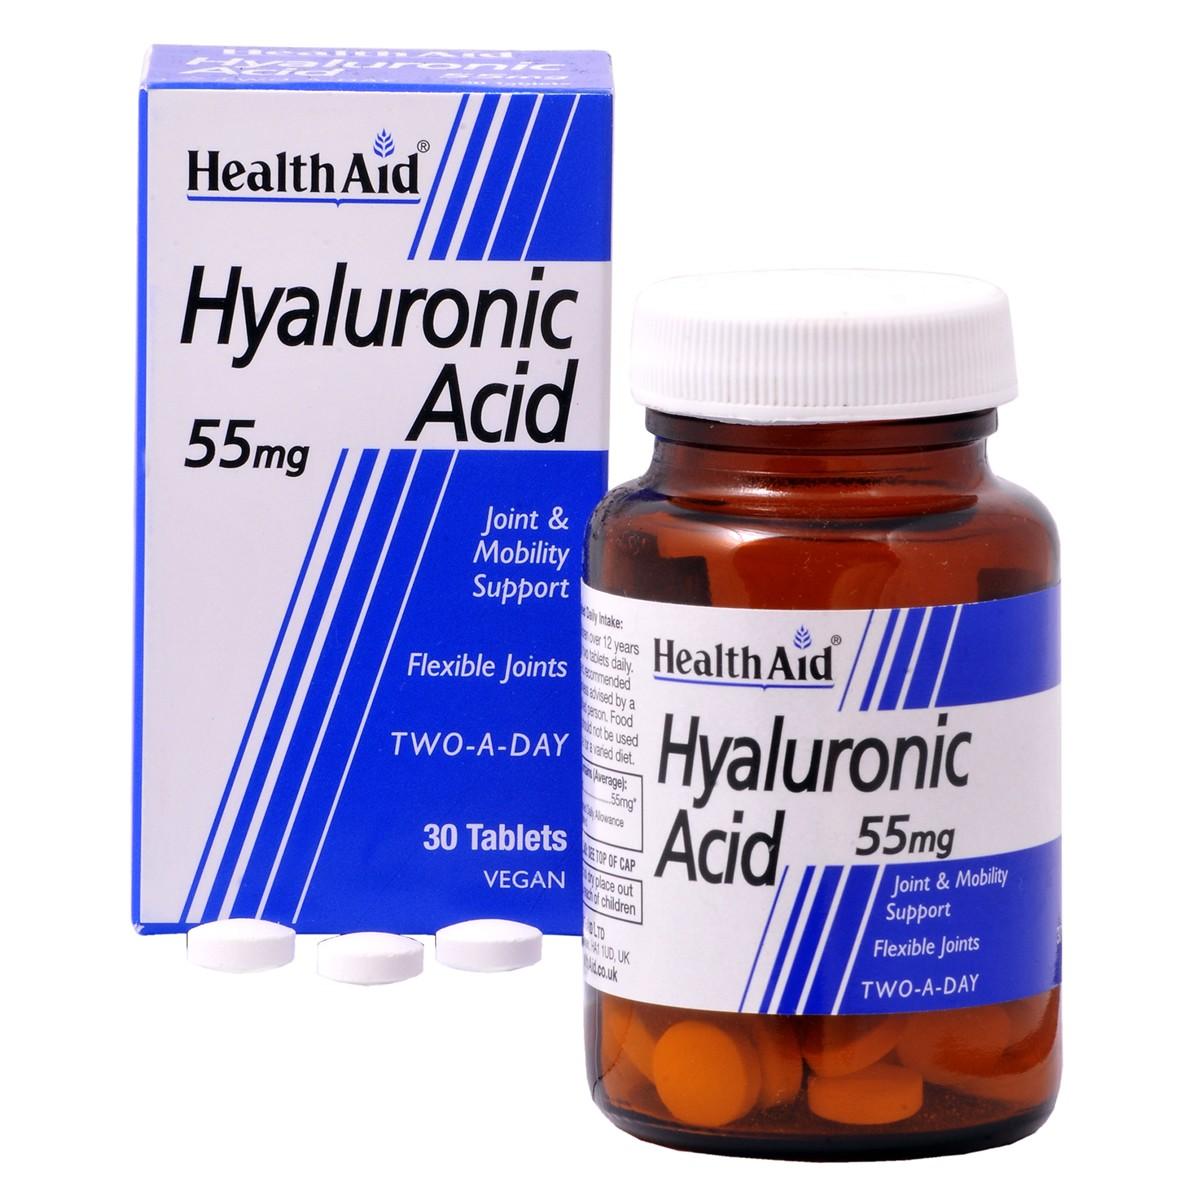 HealthAid Hyaluronic Acid 55mg